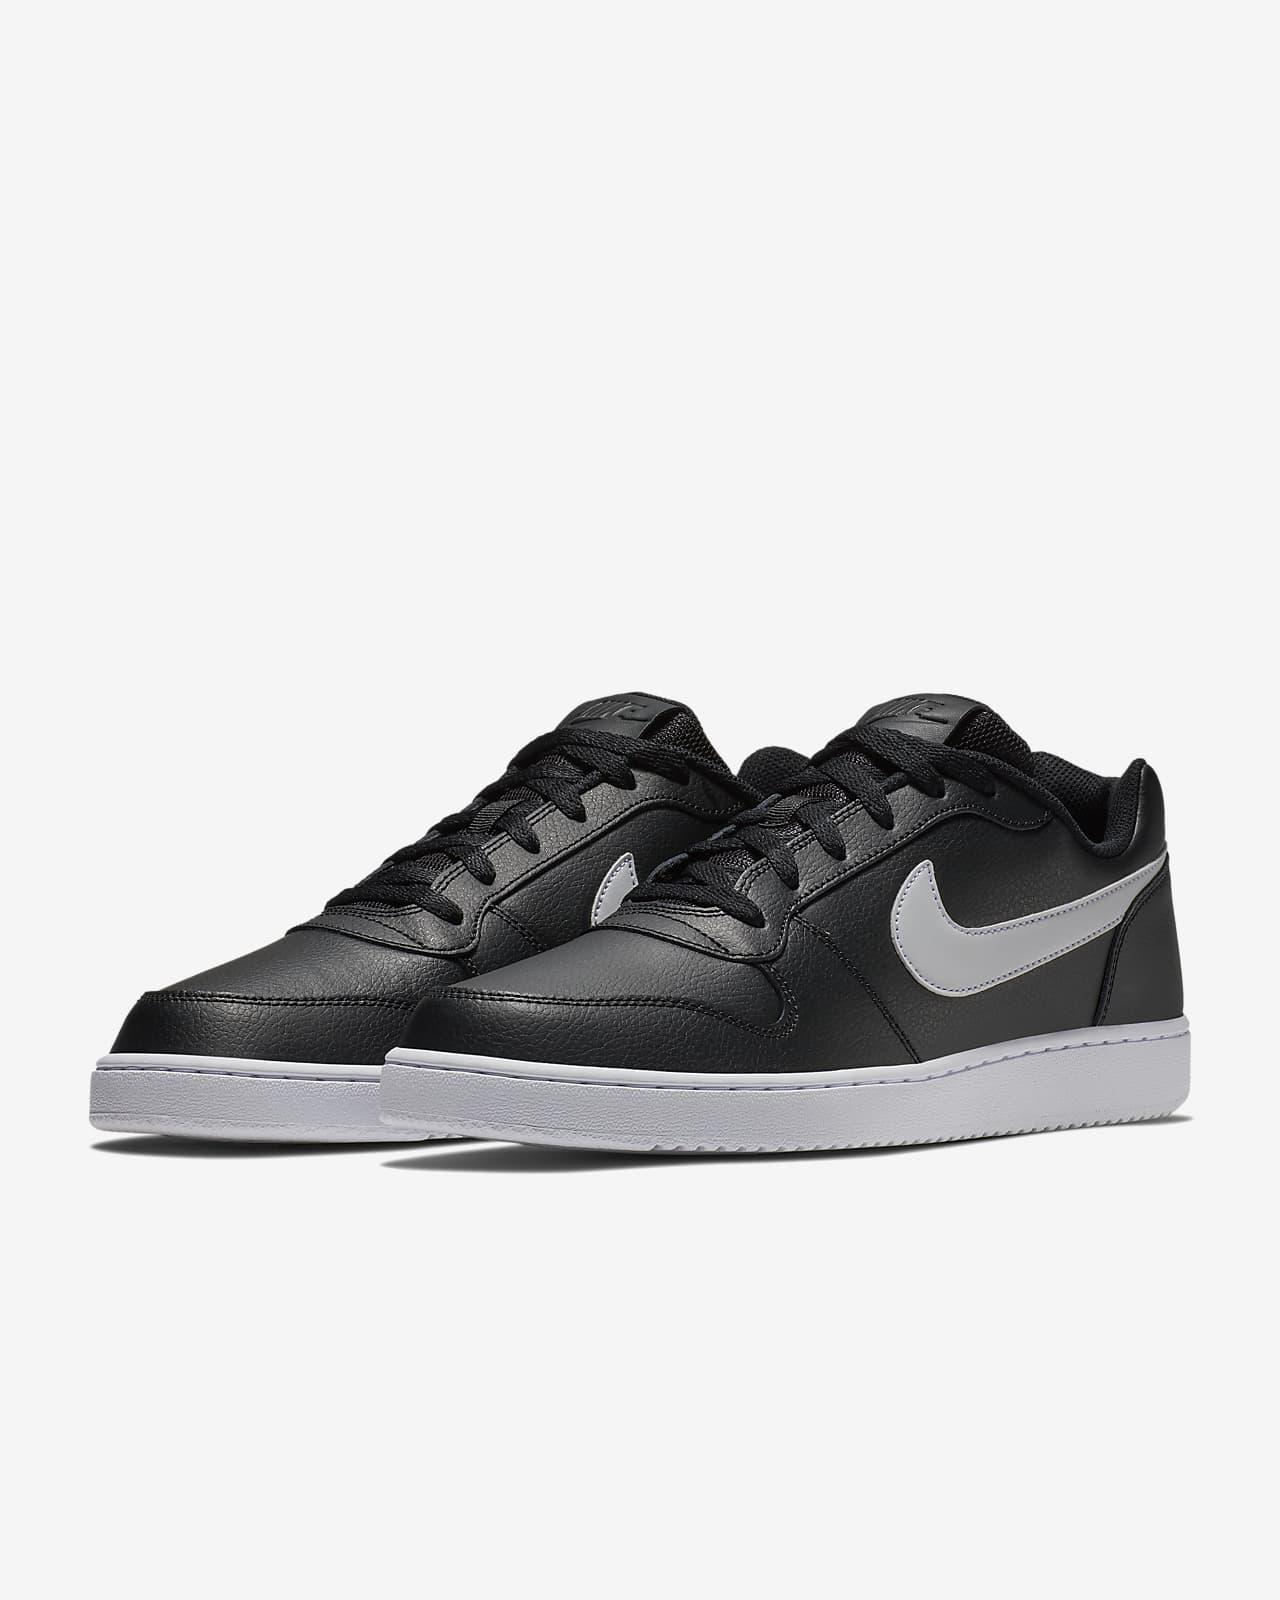 Nike Ebernon Low Men's Shoe. Nike SA